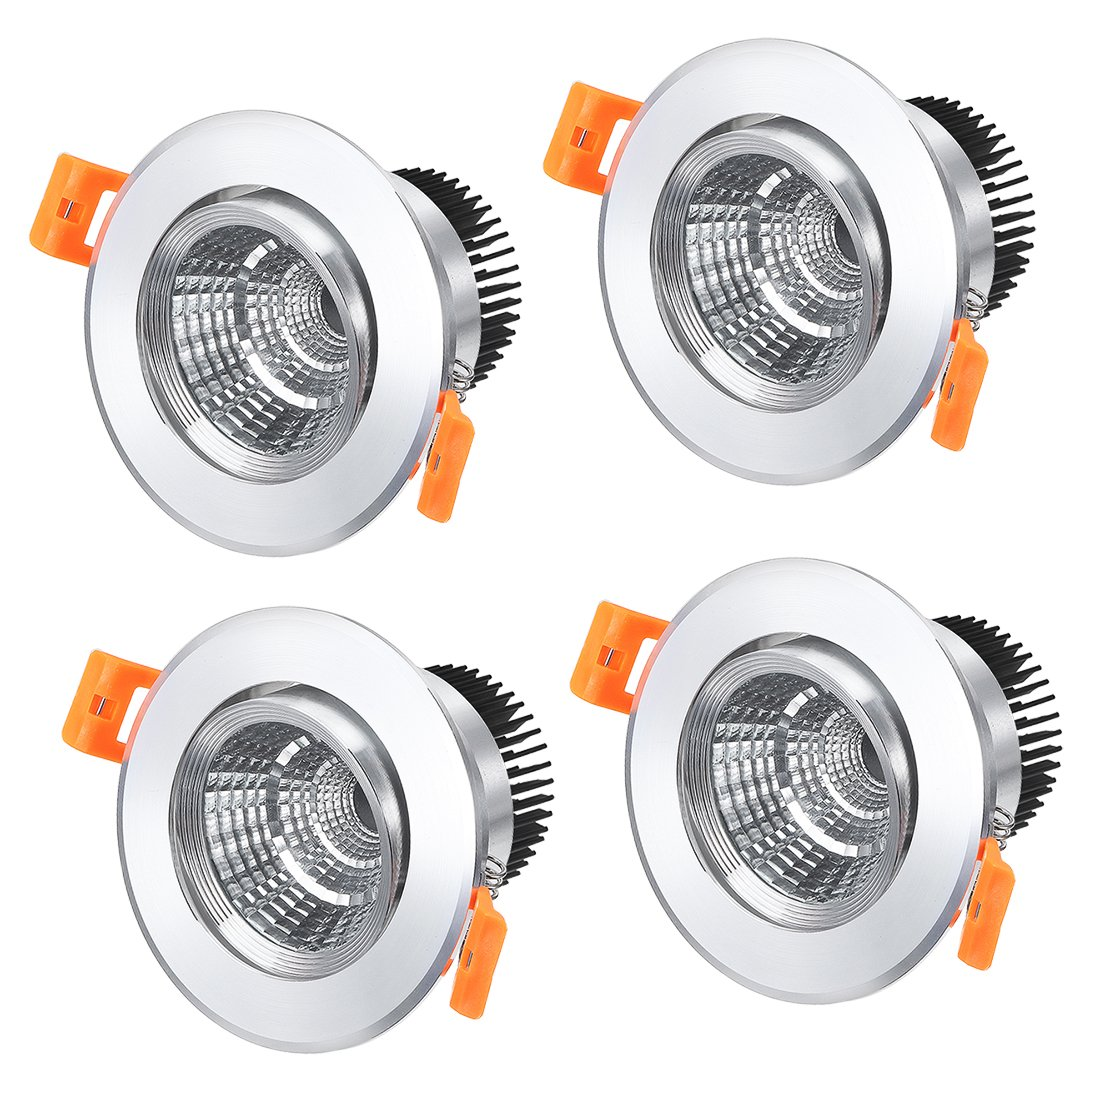 5W COB Downlight Housing Recessed Ceiling Light Spotlight Shell a17070300ux0143 uxcell 2 Pcs 90mm Dia